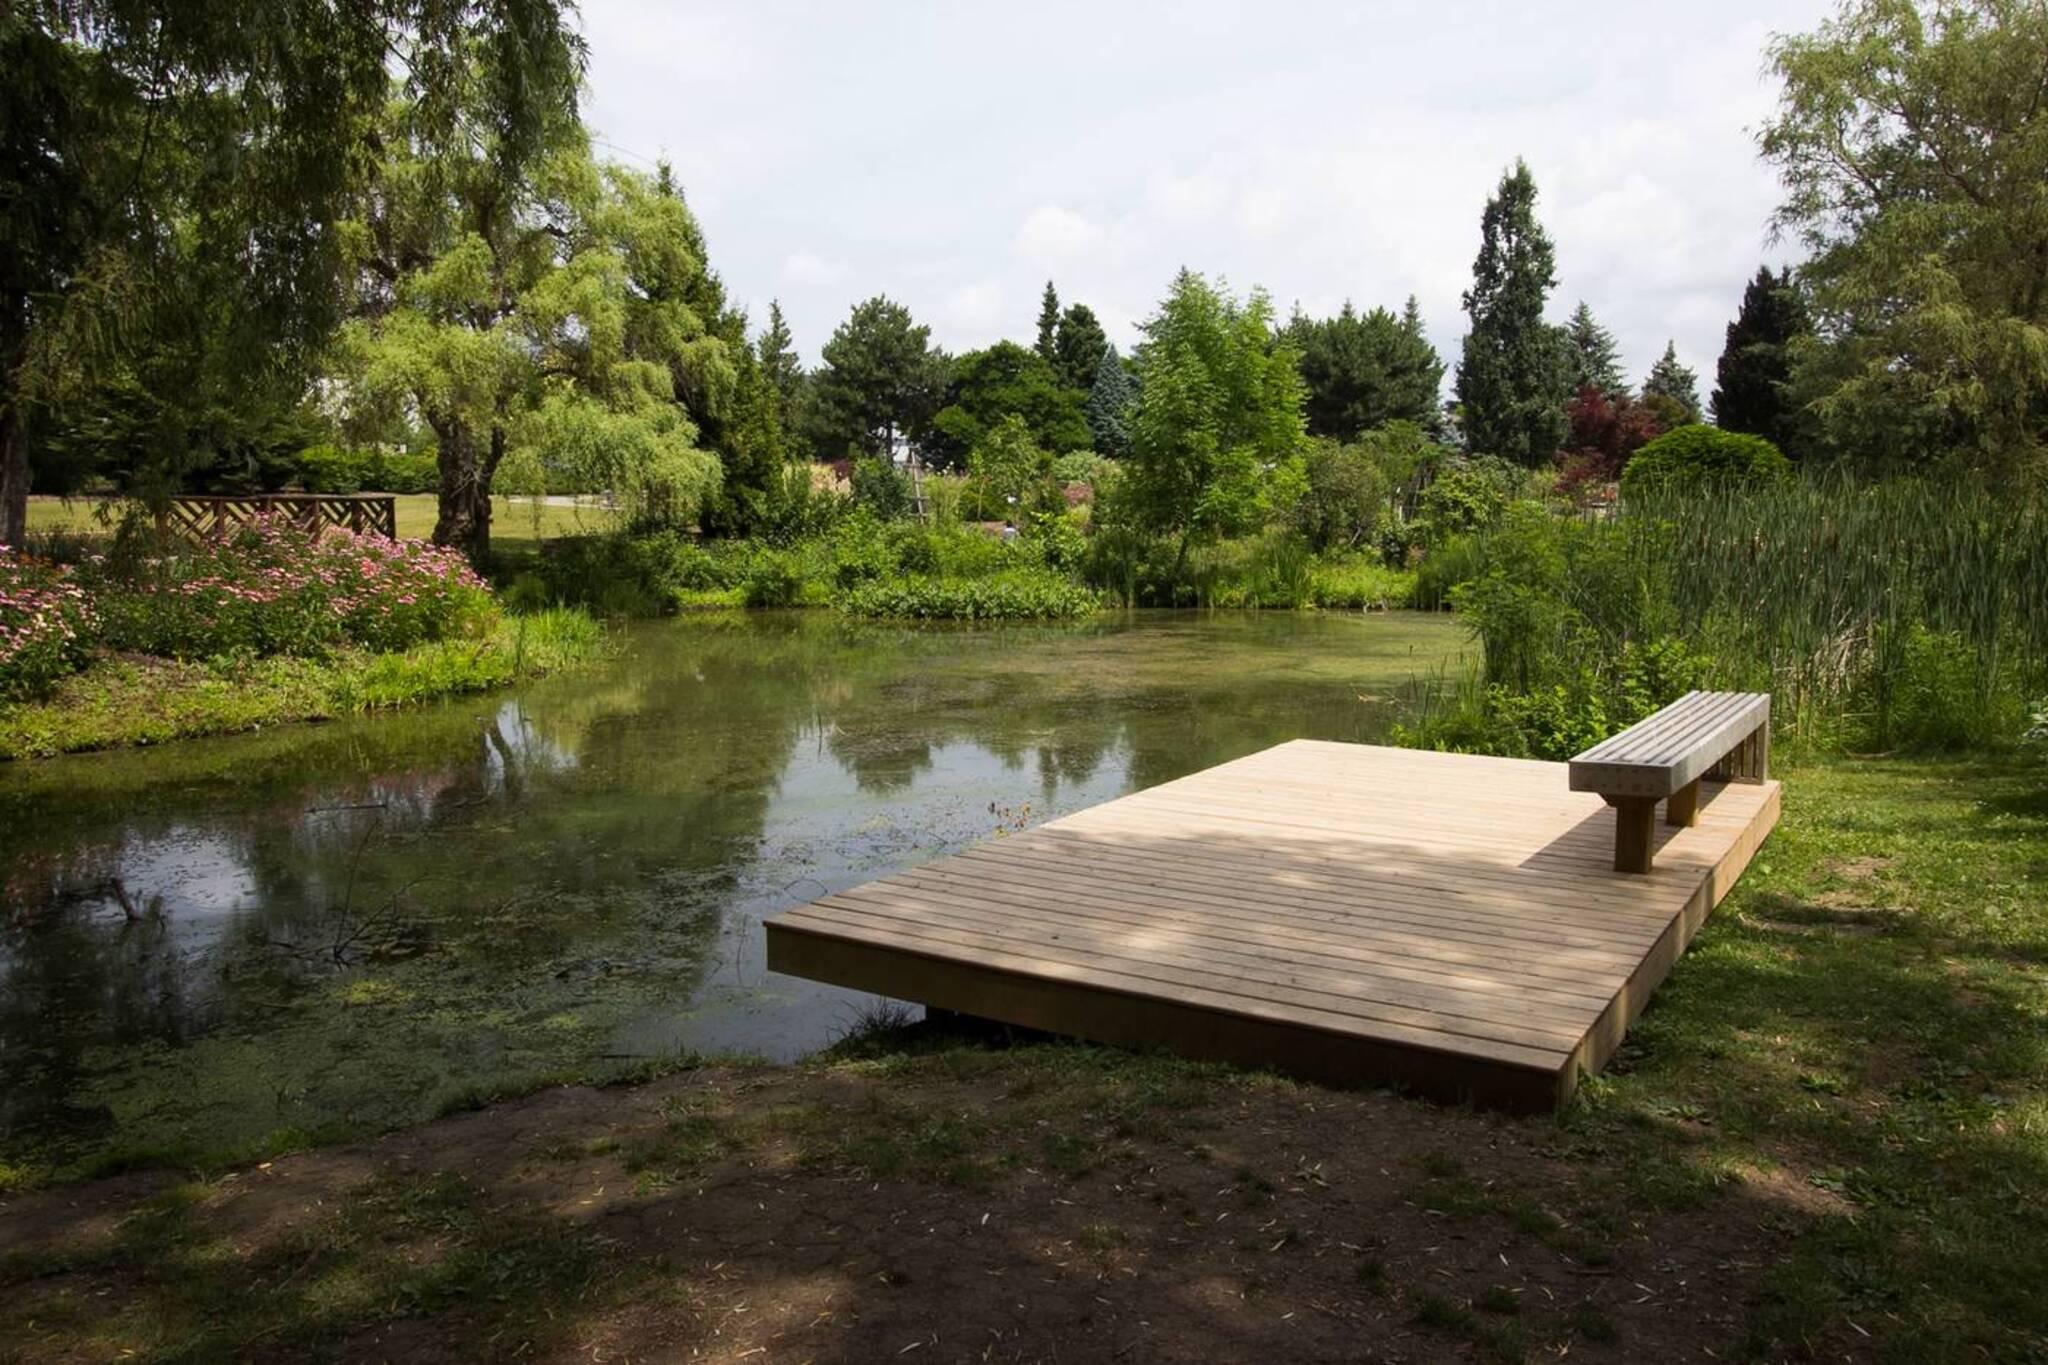 etobicoke parks